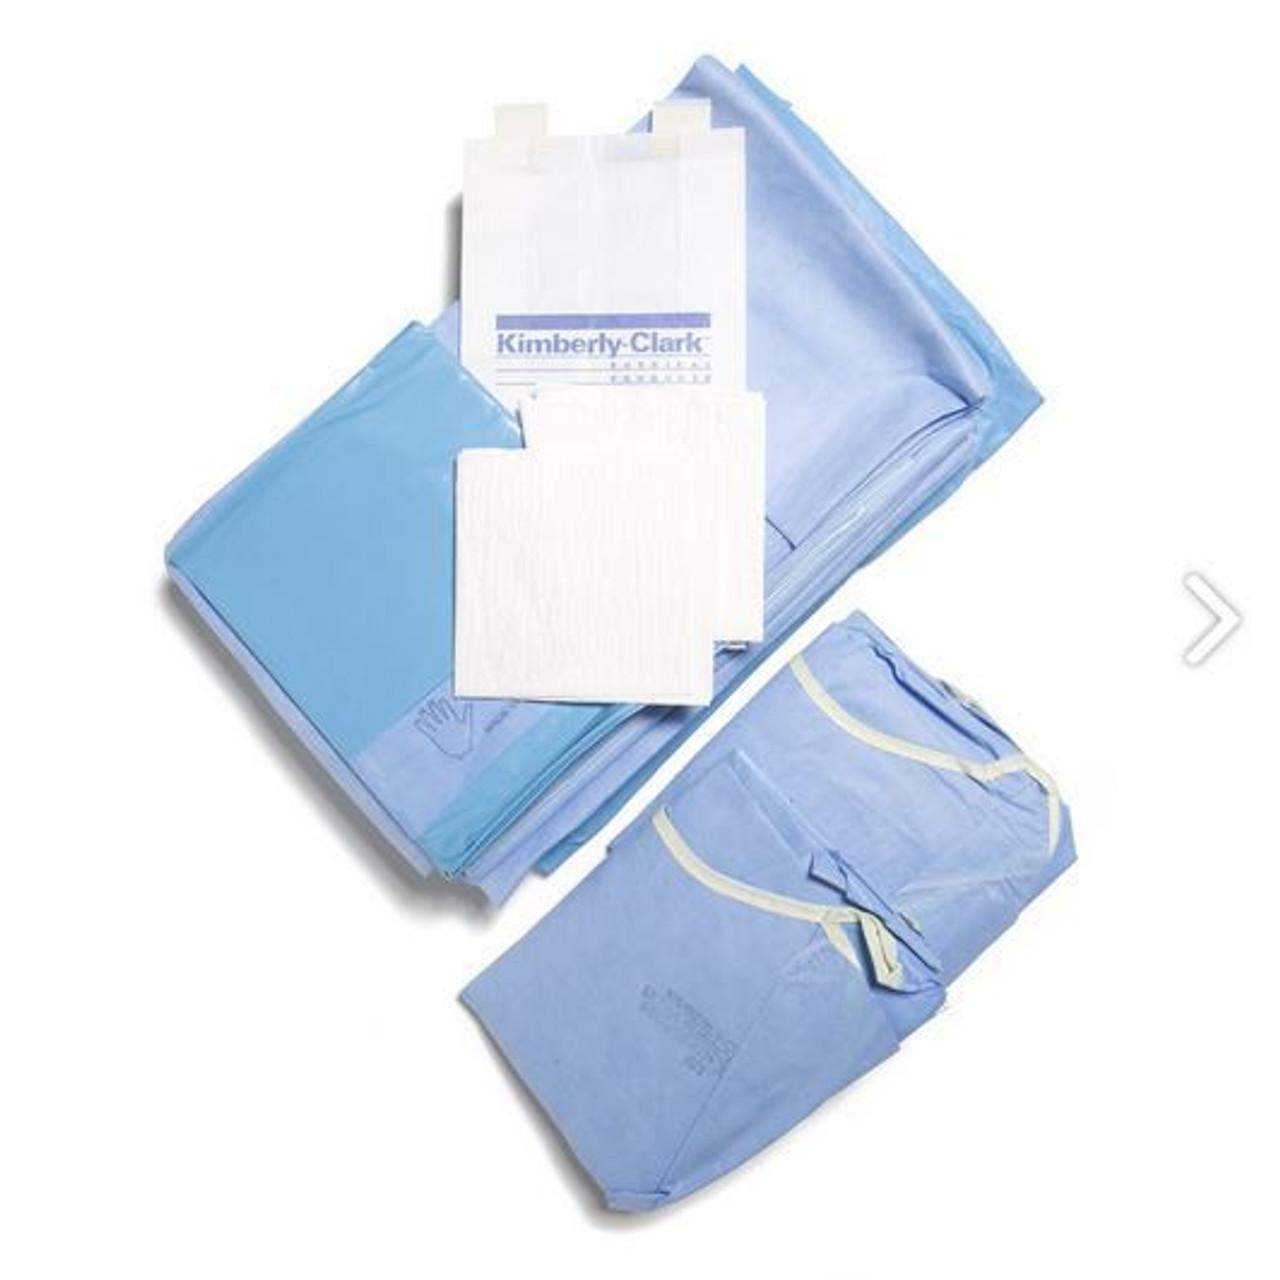 Halyard Kimguard Orthoarts Lower Extremity Pack Includes: Extremity Prep  Pad, Lower Extremity Drape 114